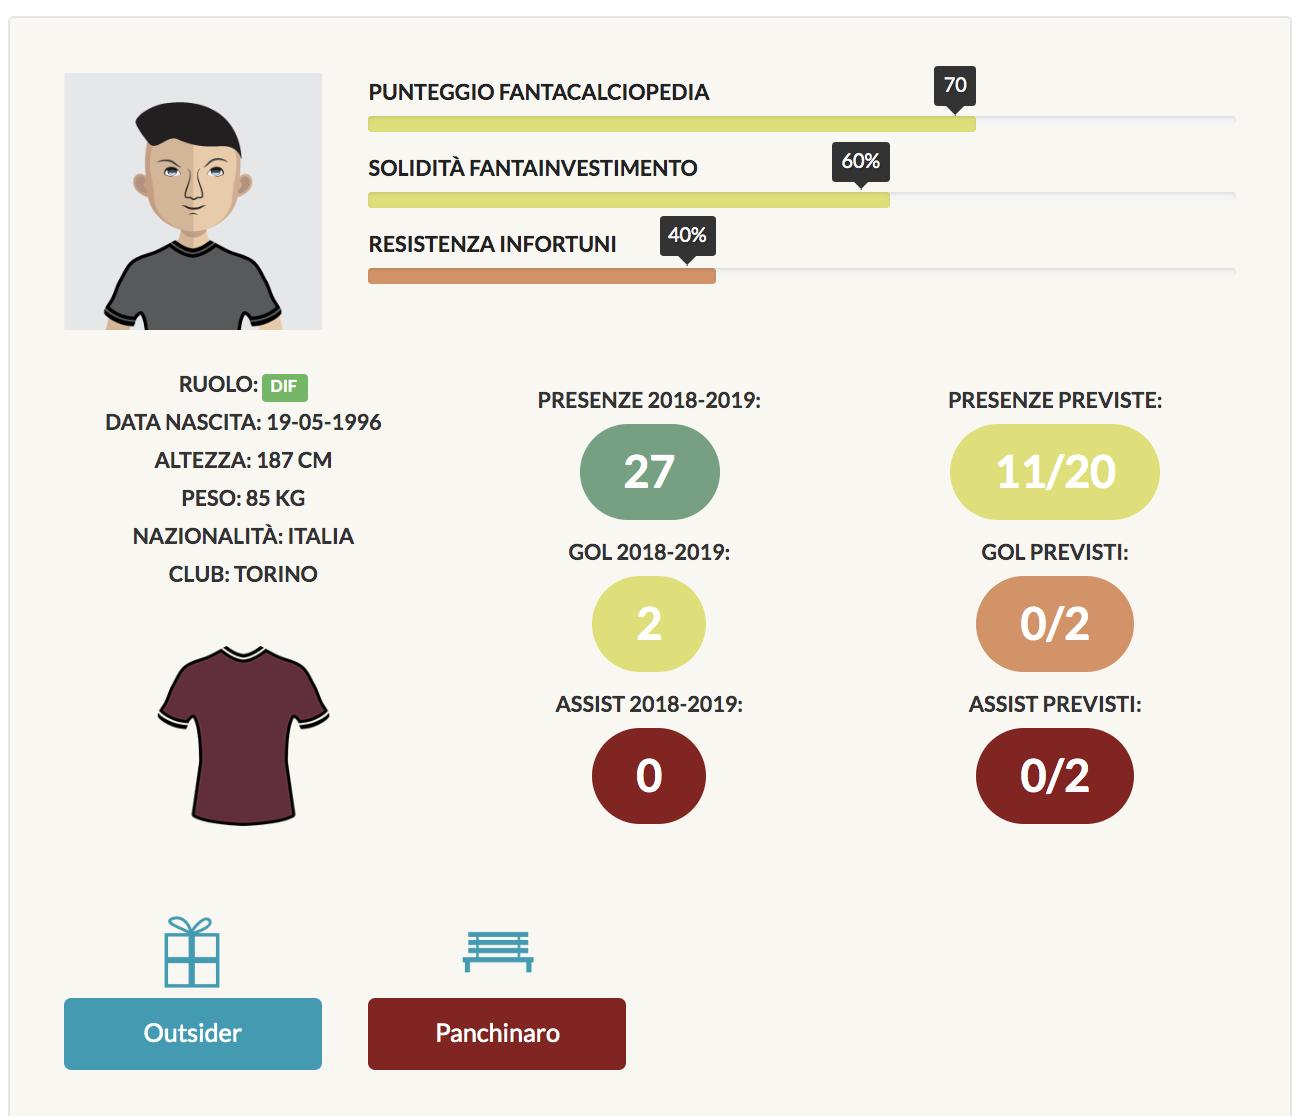 kevin bonifazi infografica fantacalcio 2019/20